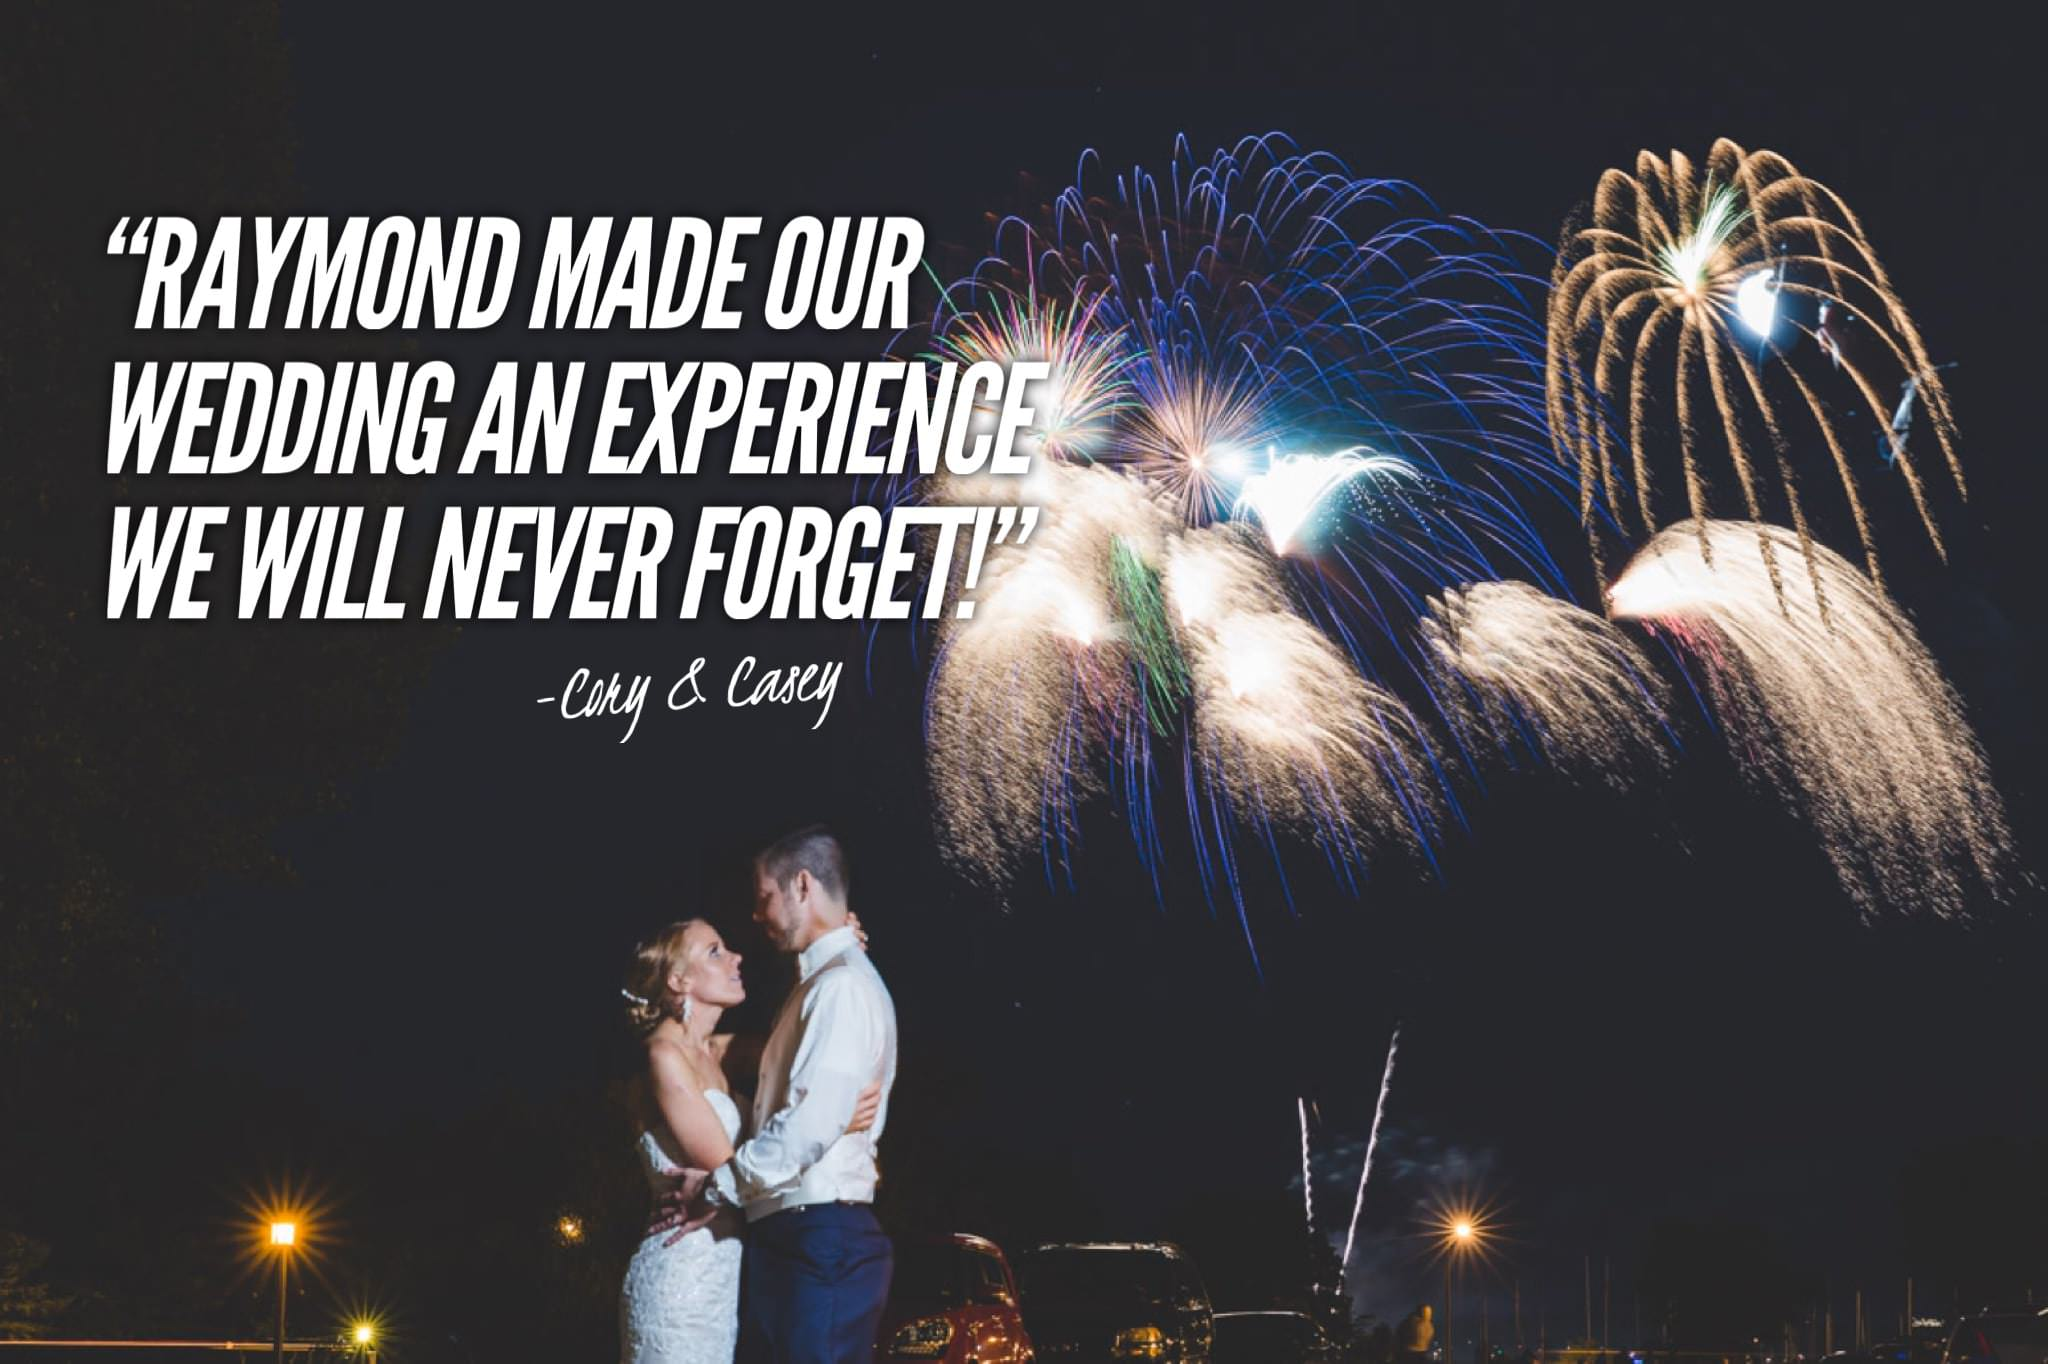 couple under wedding fireworks.jpg